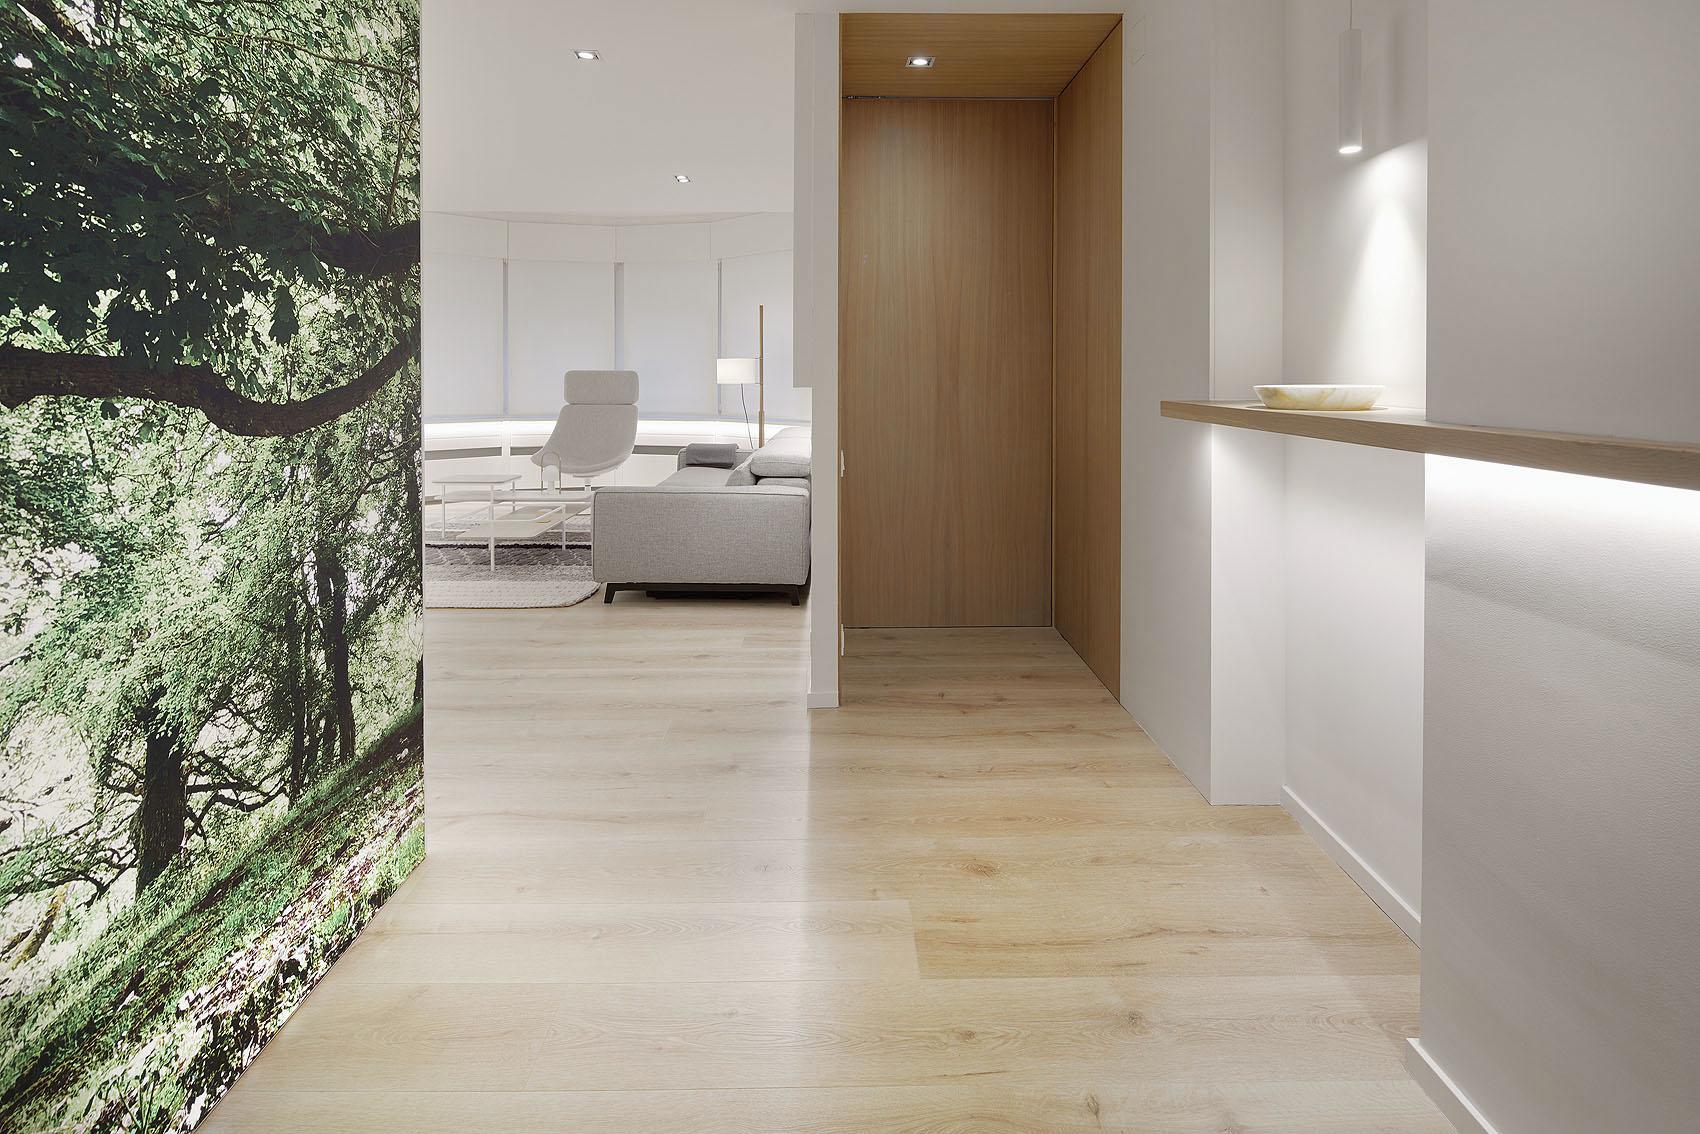 Apartamento Usandizaga by Estudio Arquea - Iñaki Caperochipi - Fotografía